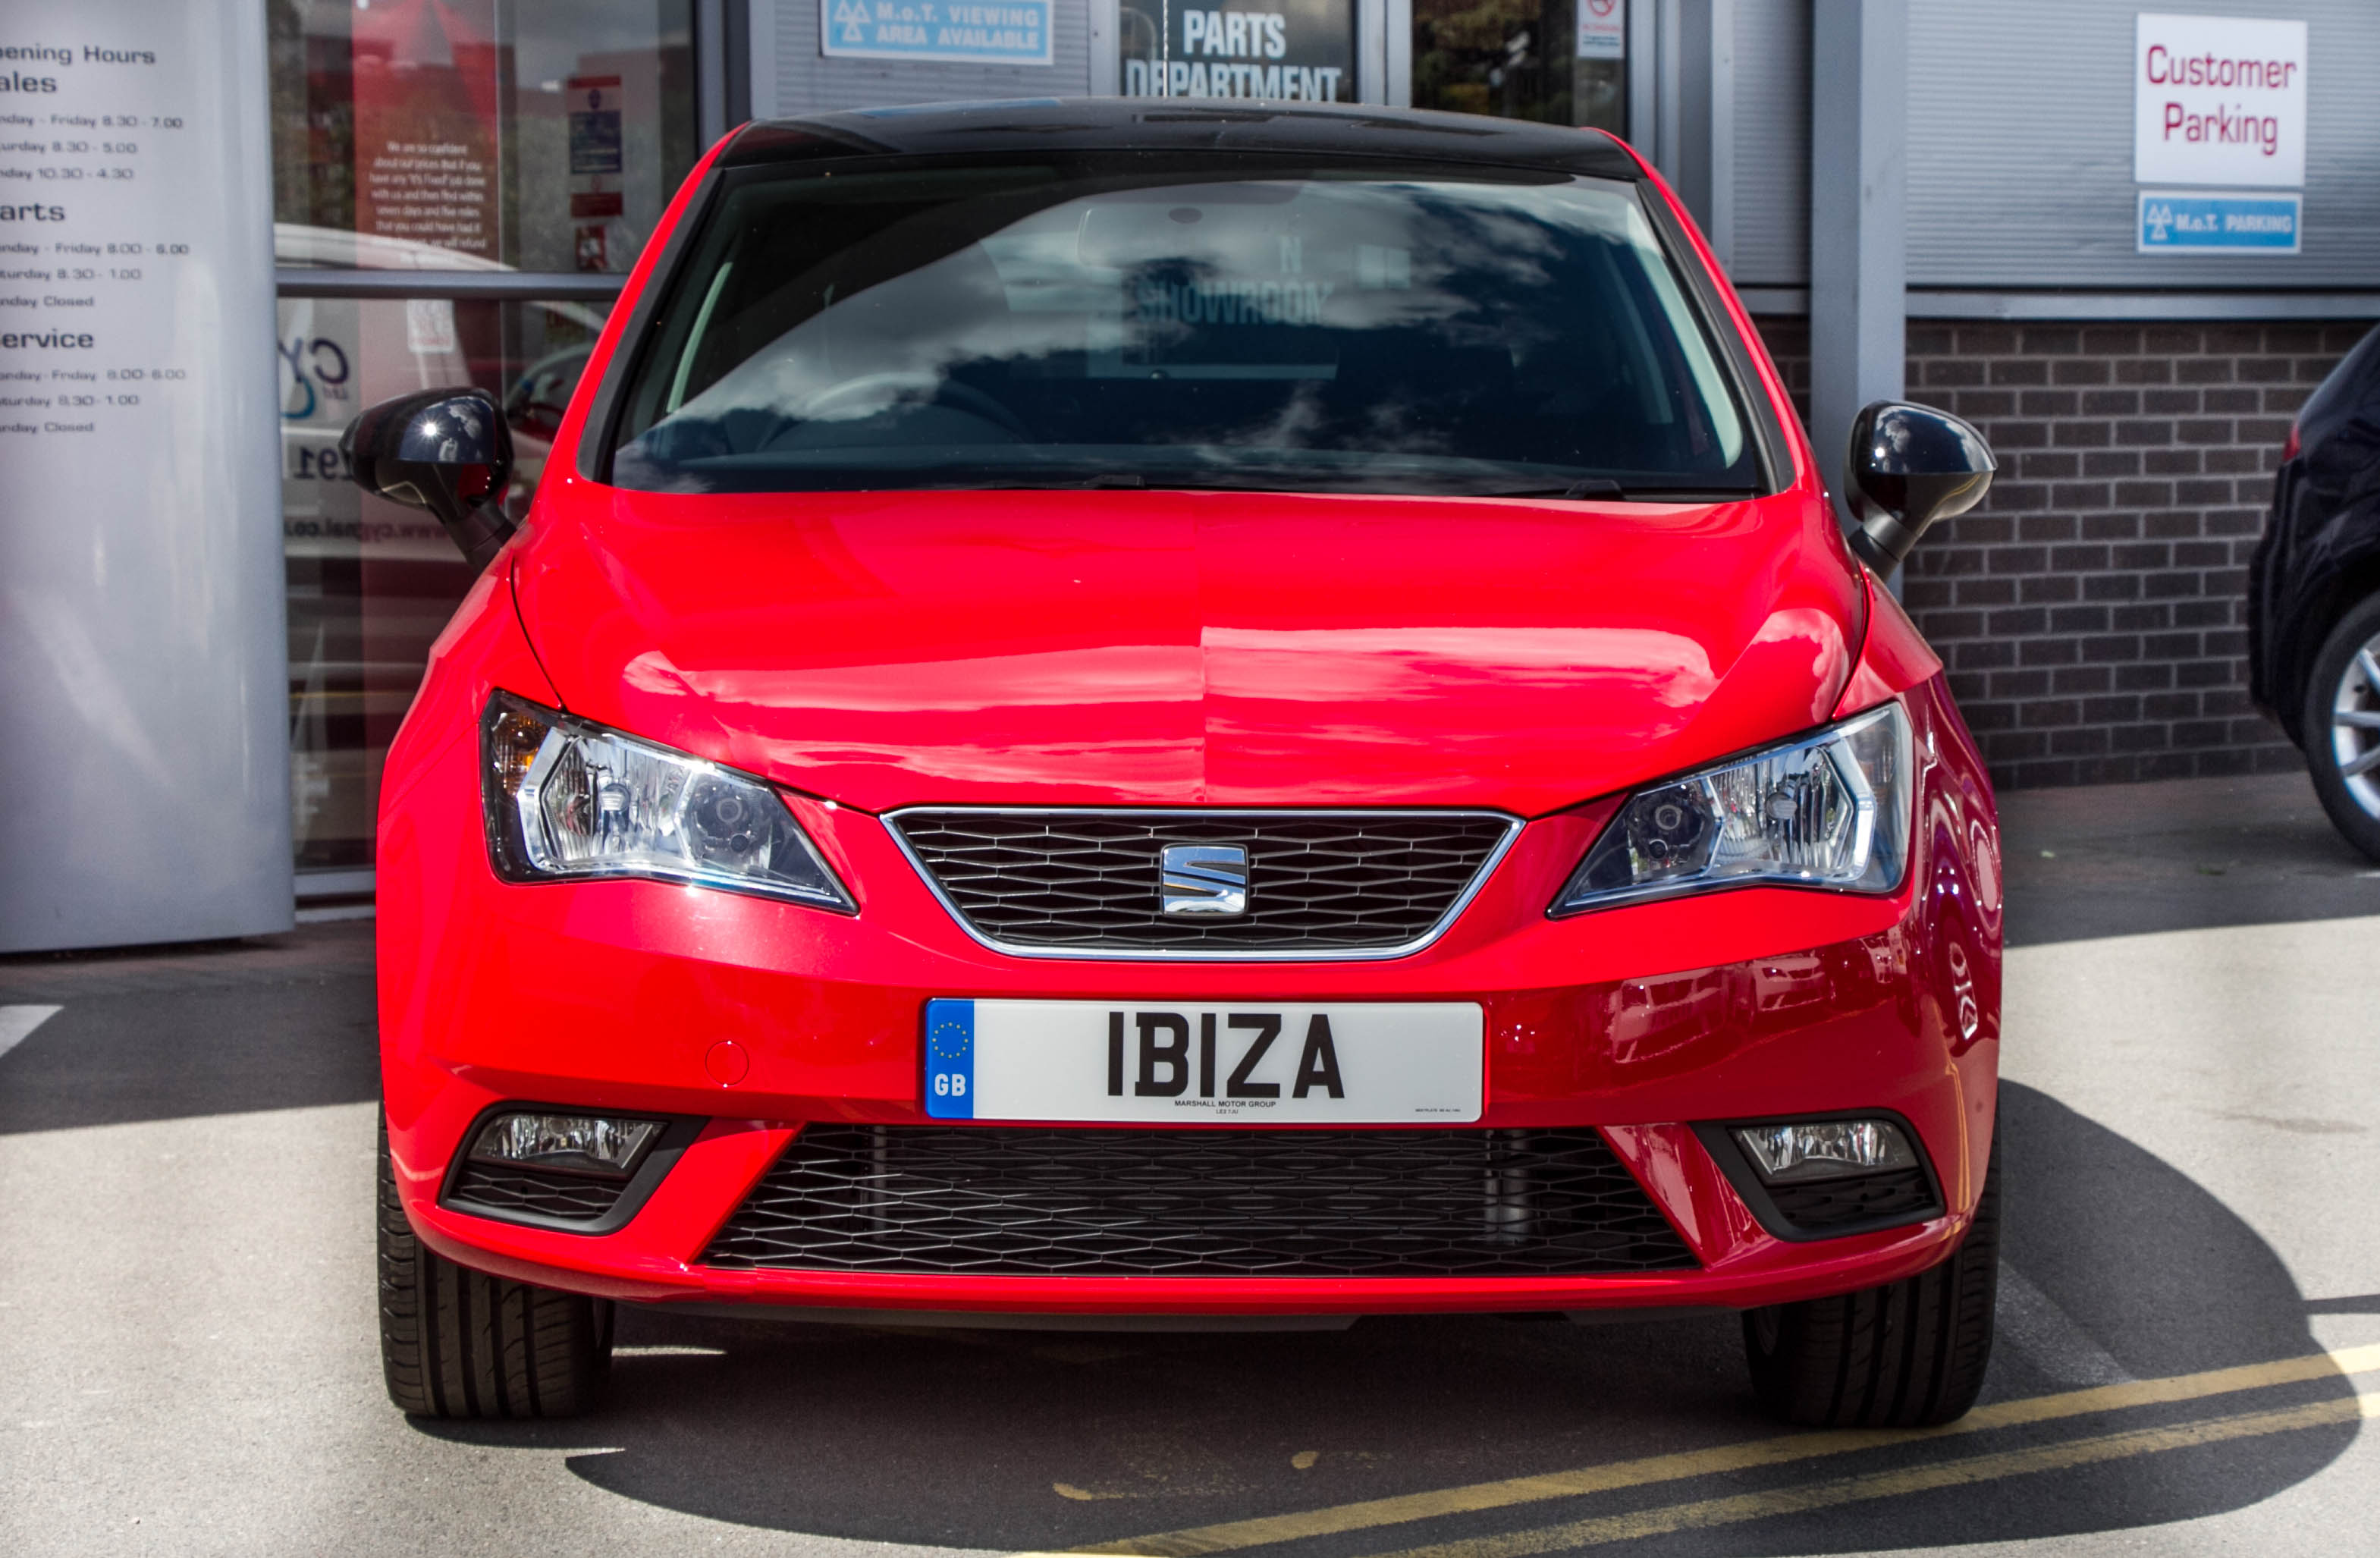 Review: Seat Ibiza